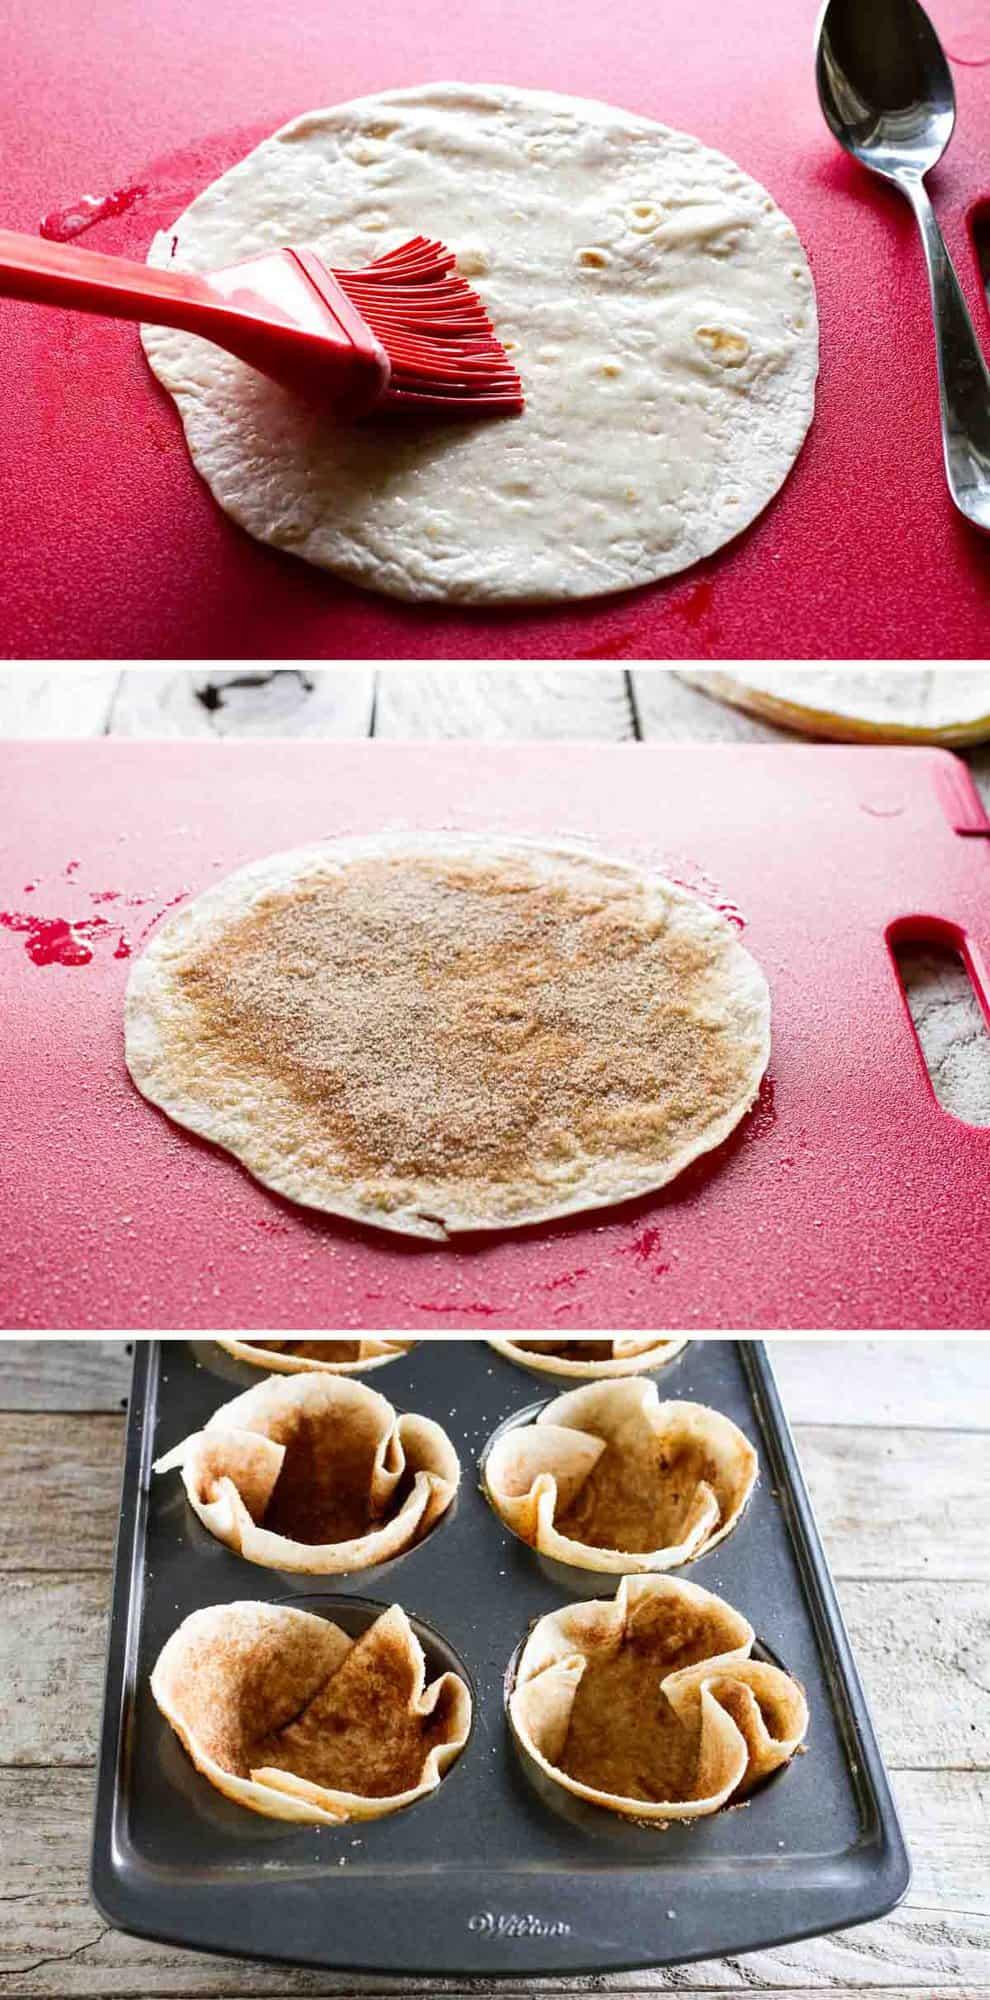 steps to make cinnamon sugar tortilla bowls